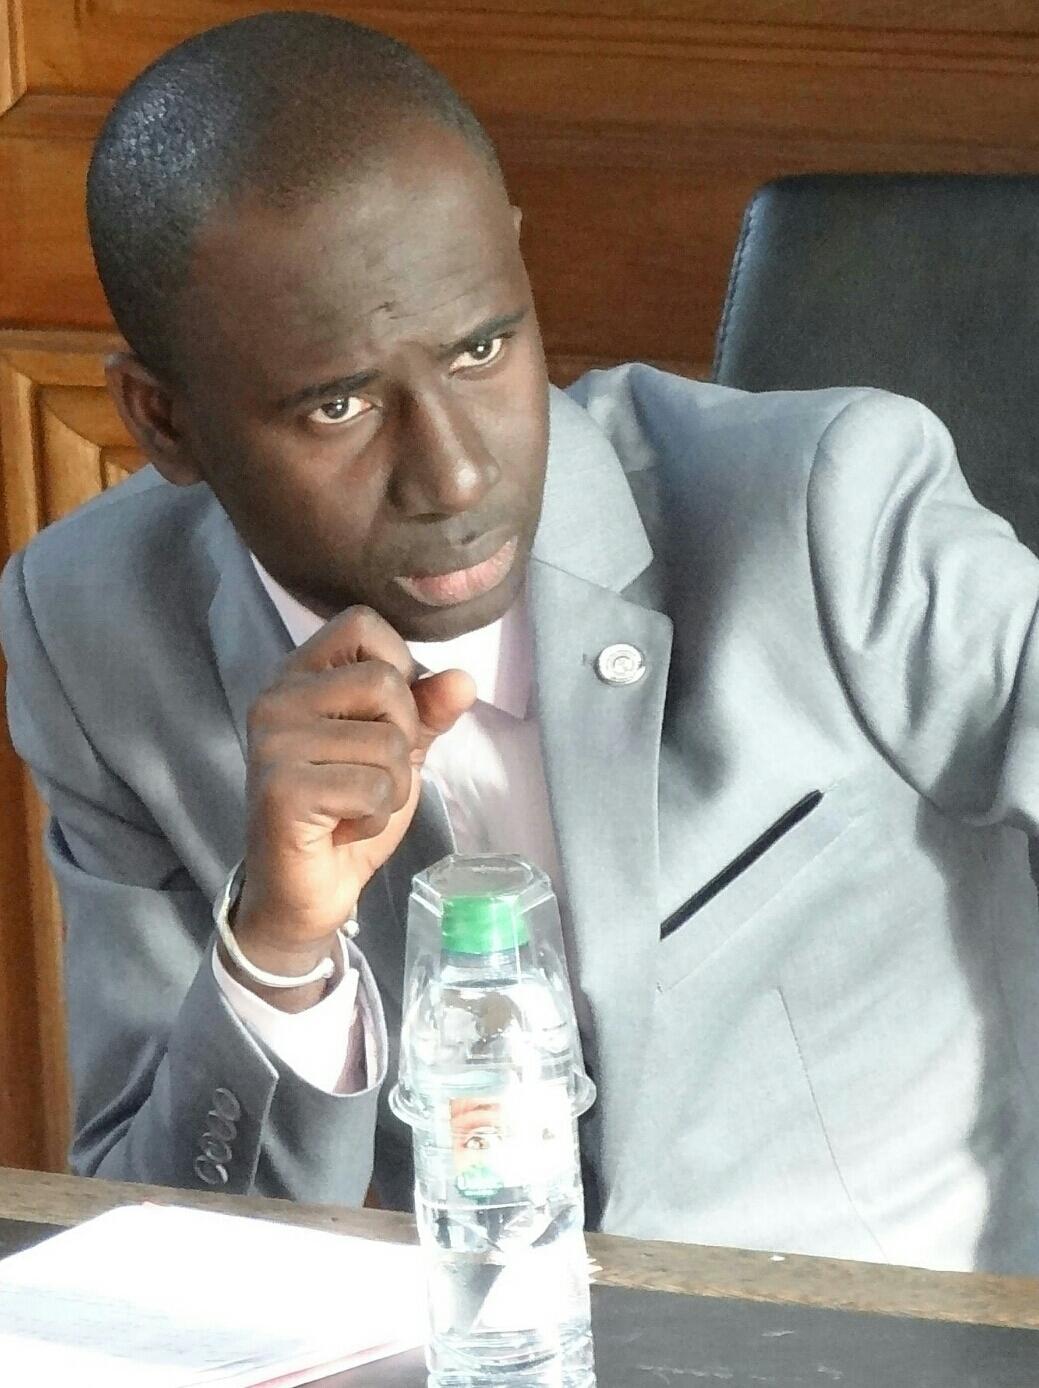 Meurtres d'enfants: cri de coeur d'un sénégalais de la Diaspora